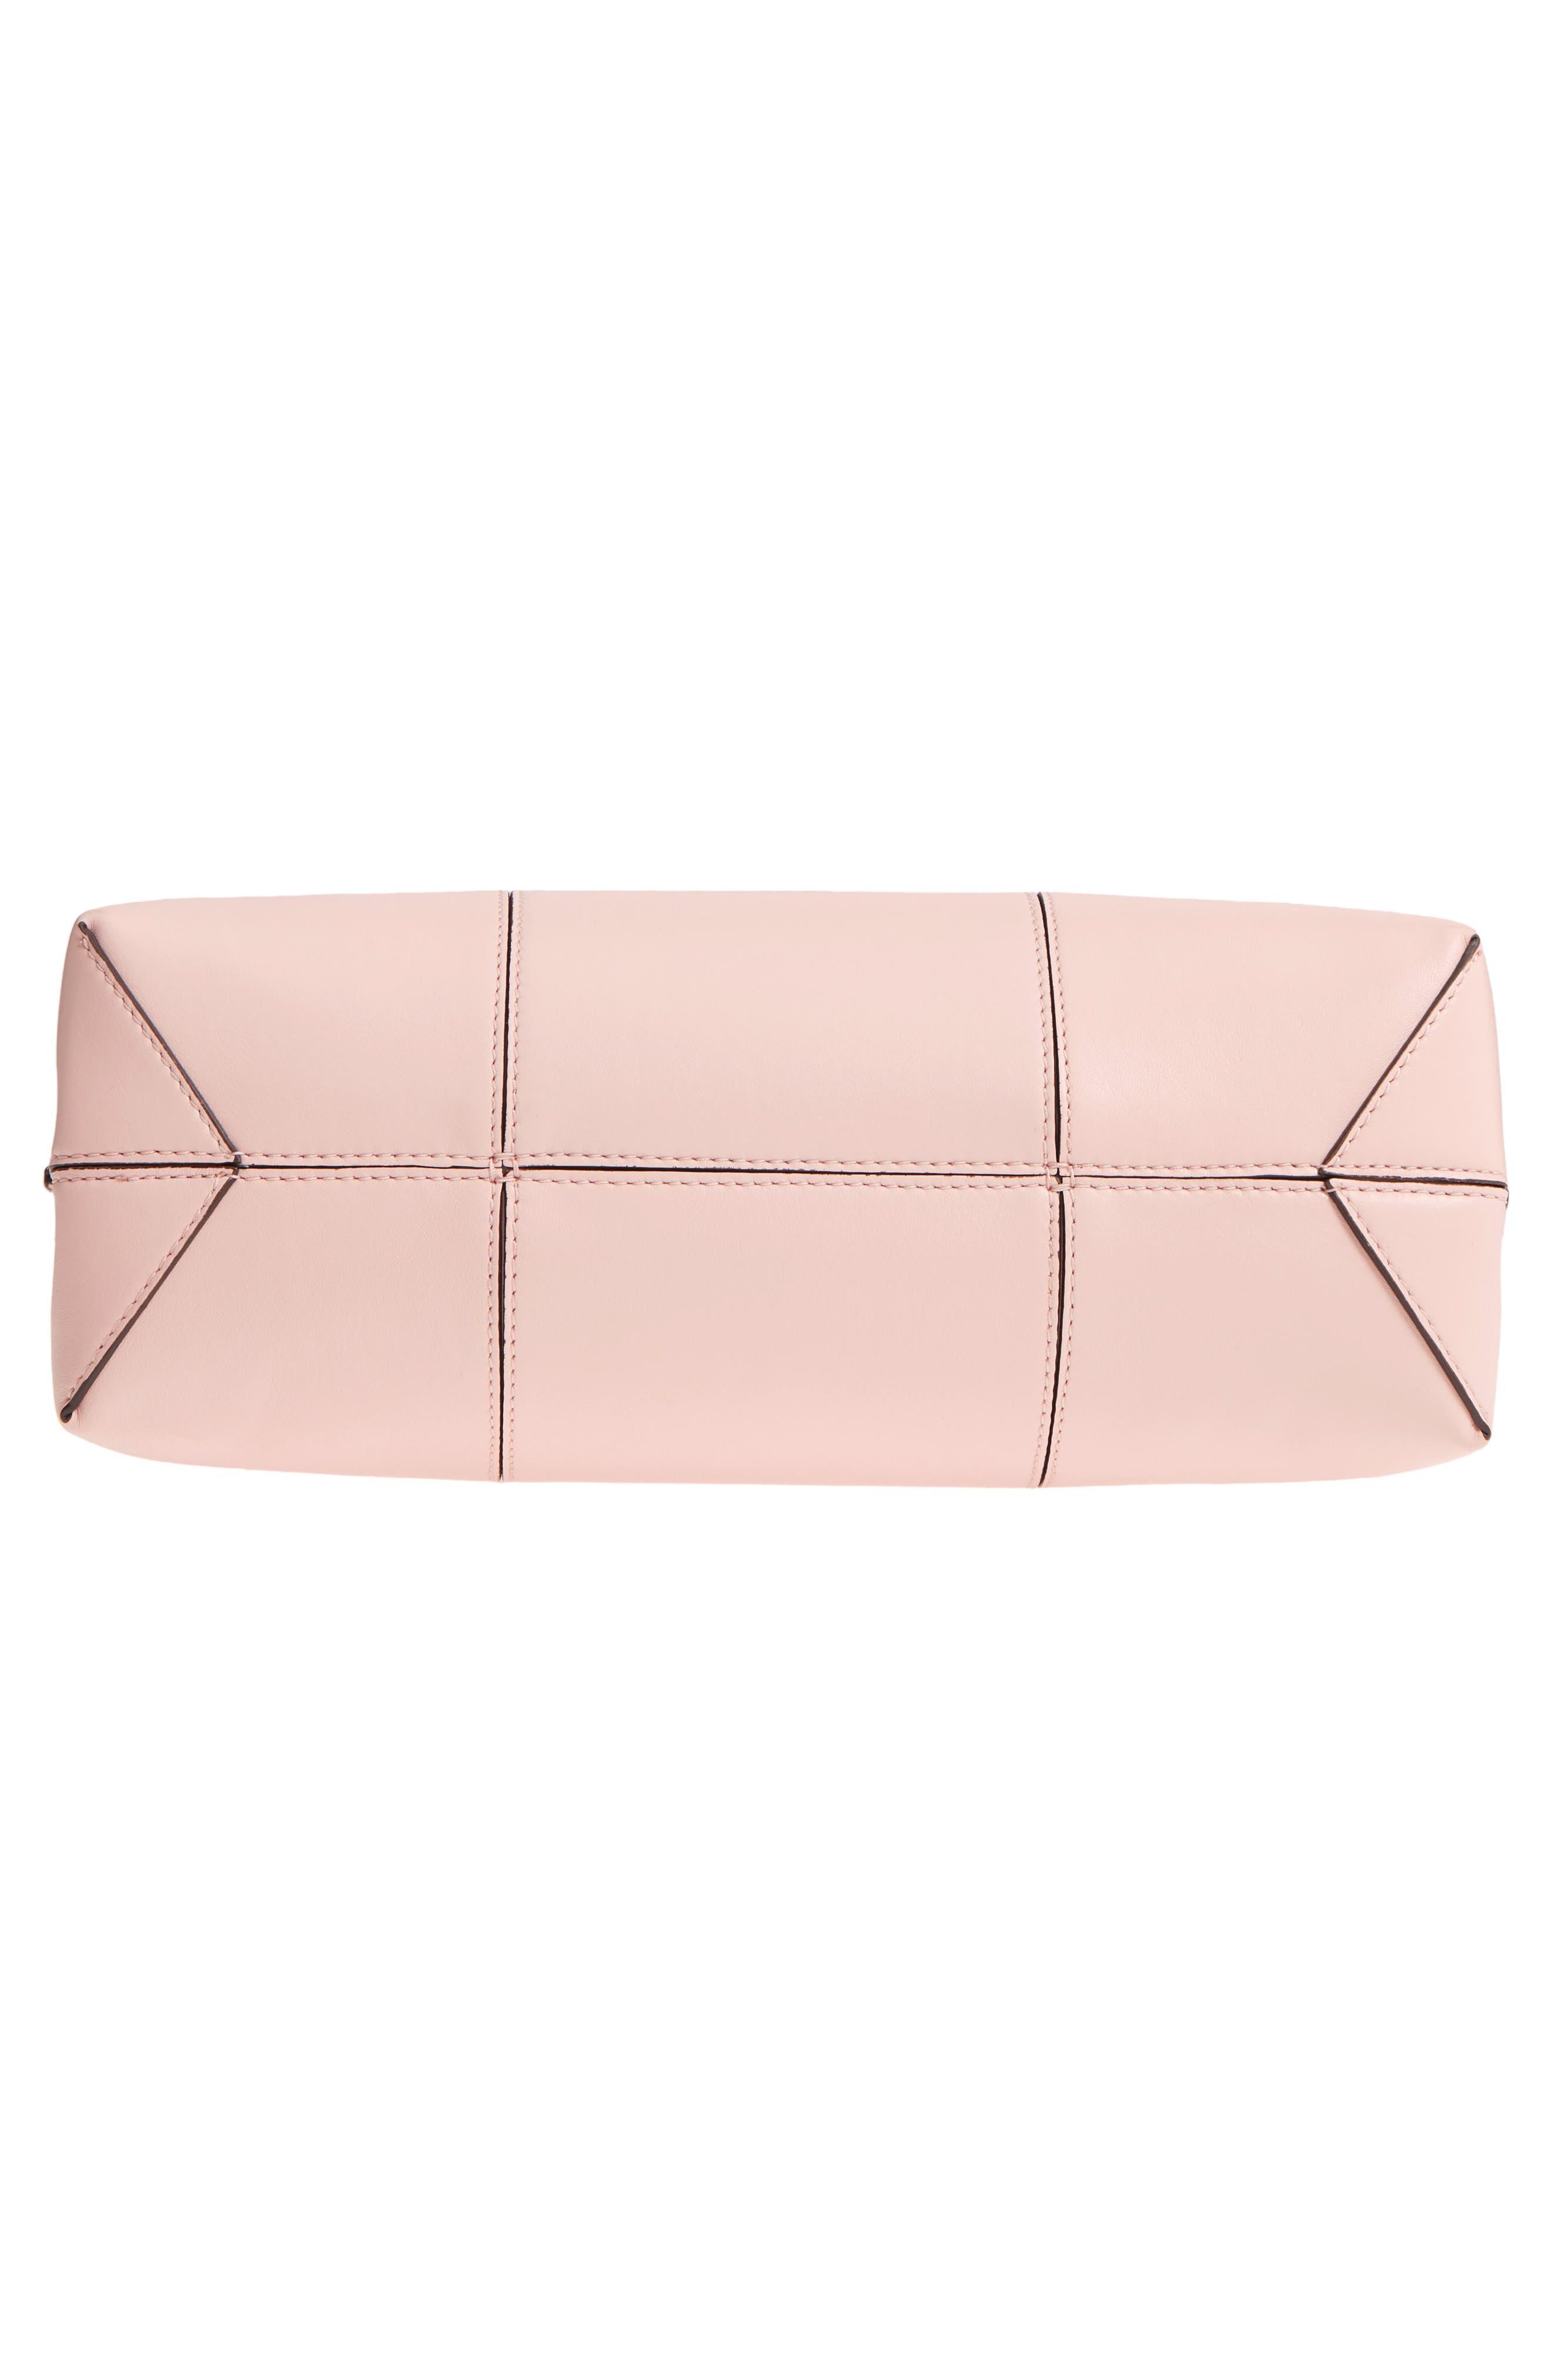 Block T Leather Top Handle Satchel,                             Alternate thumbnail 8, color,                             Shell Pink/ Goan Sand